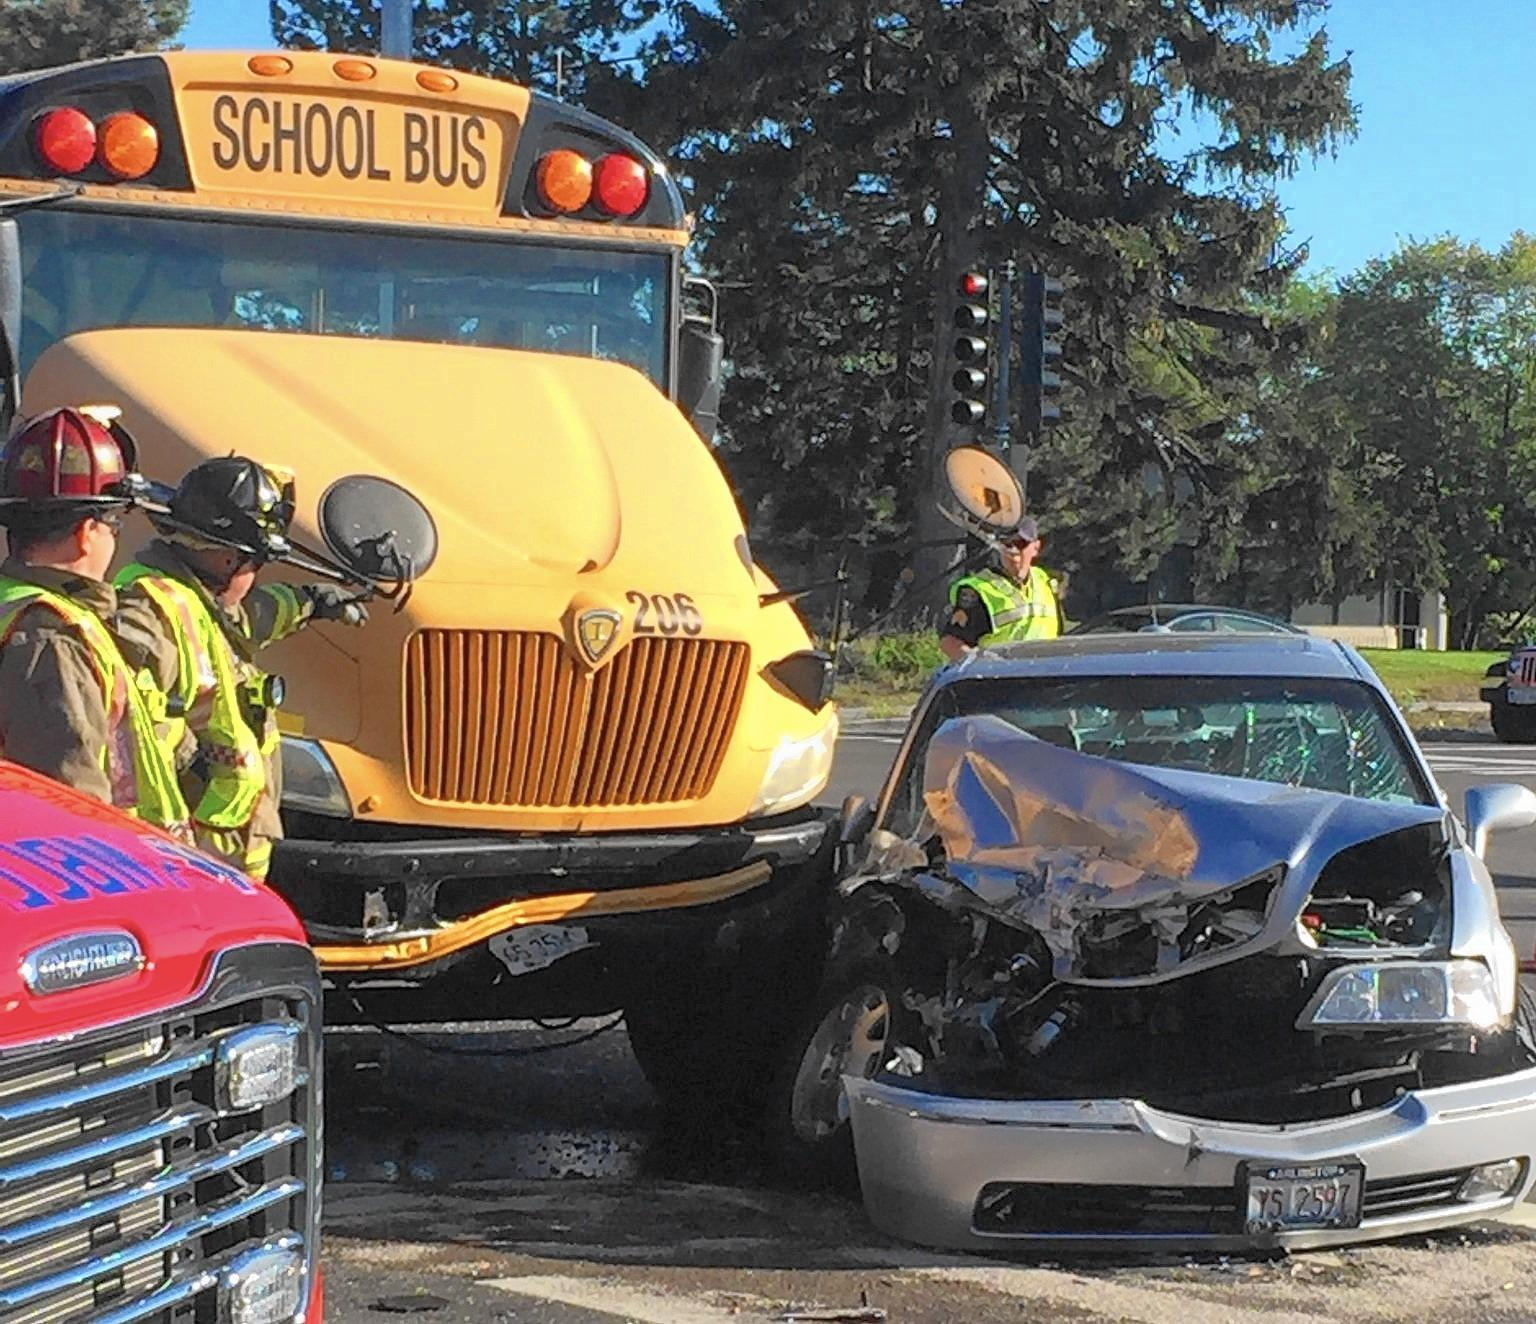 7 Taken To Hospitals After Northbrook School Bus Crash